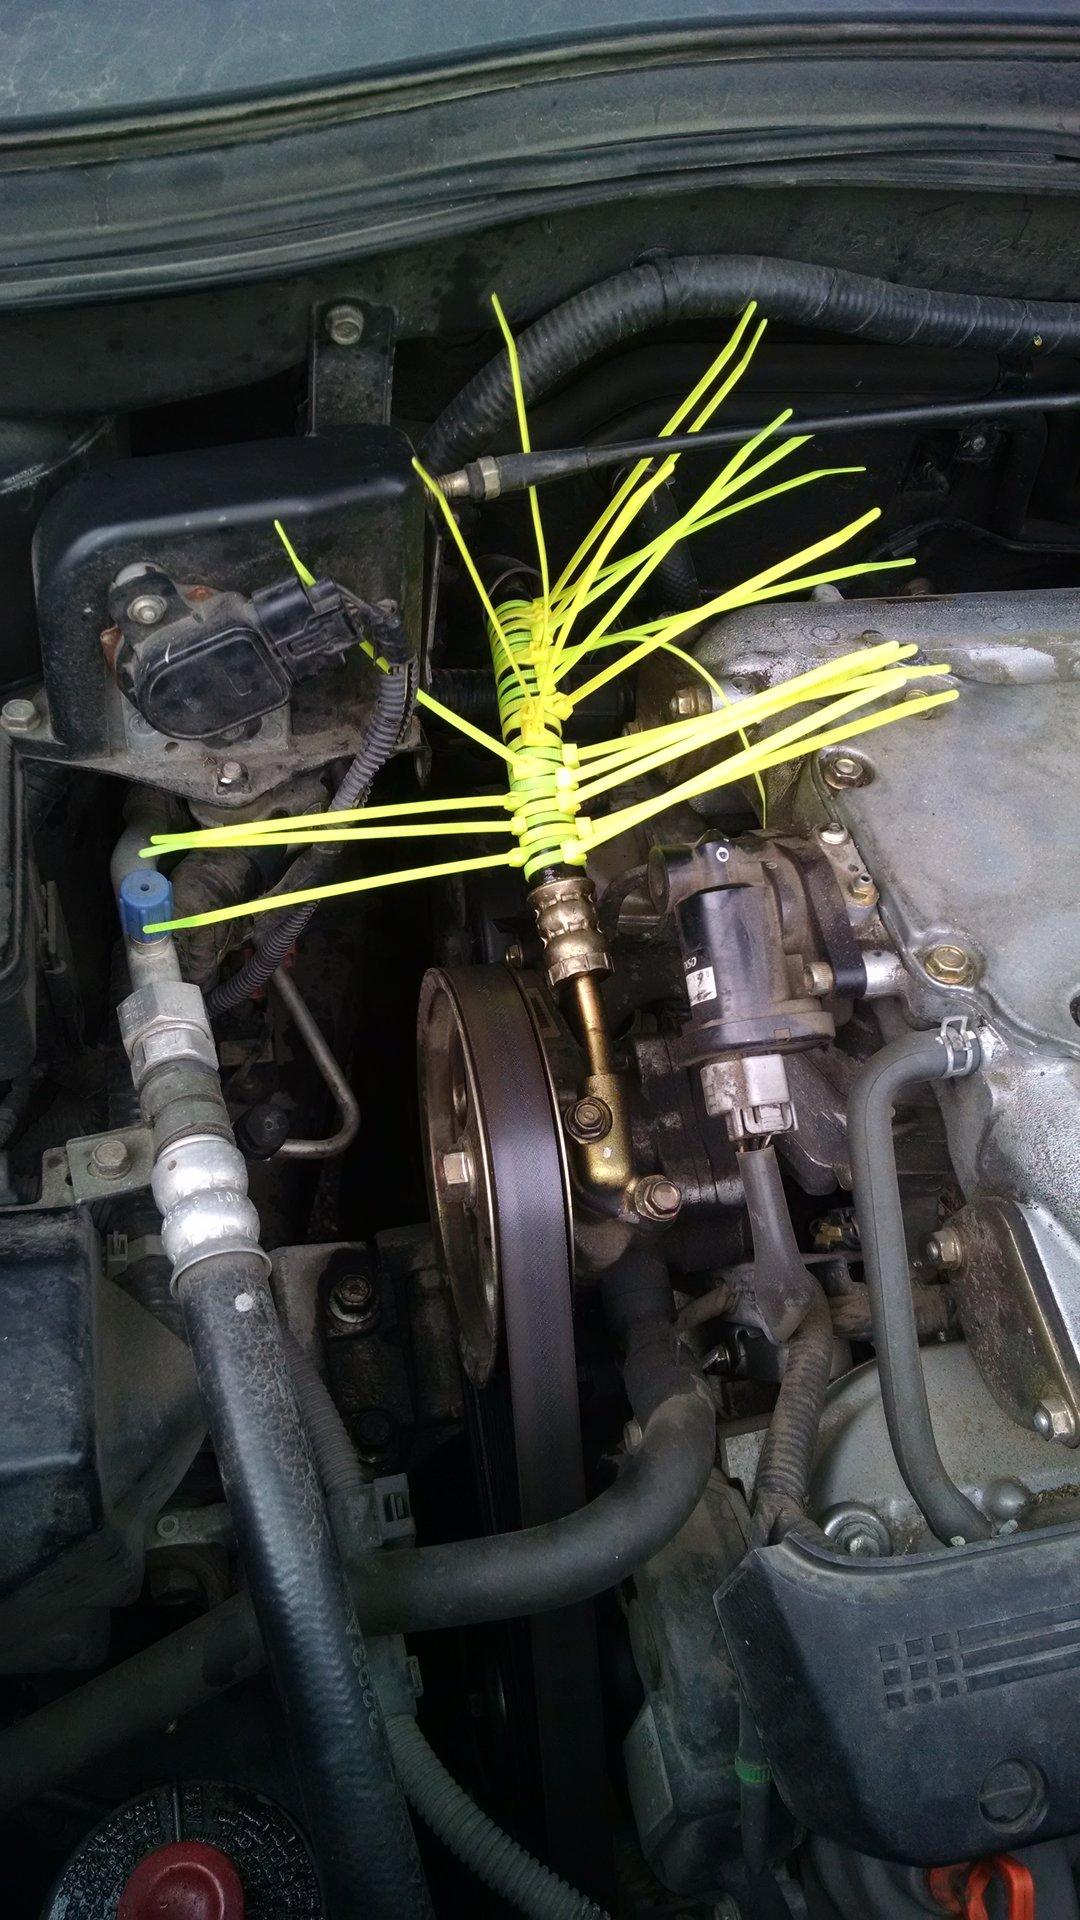 Power Steering Hose Leak At Fitting